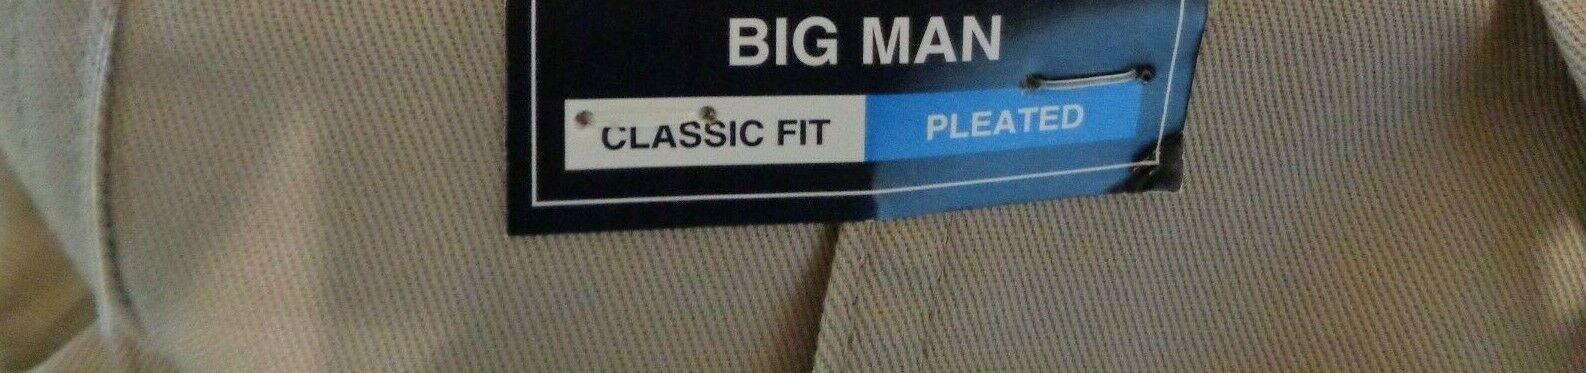 Roundtree & Yorke Size 46 ELASTIC WAIST Khaki Cotton Pleated New Mens Shorts